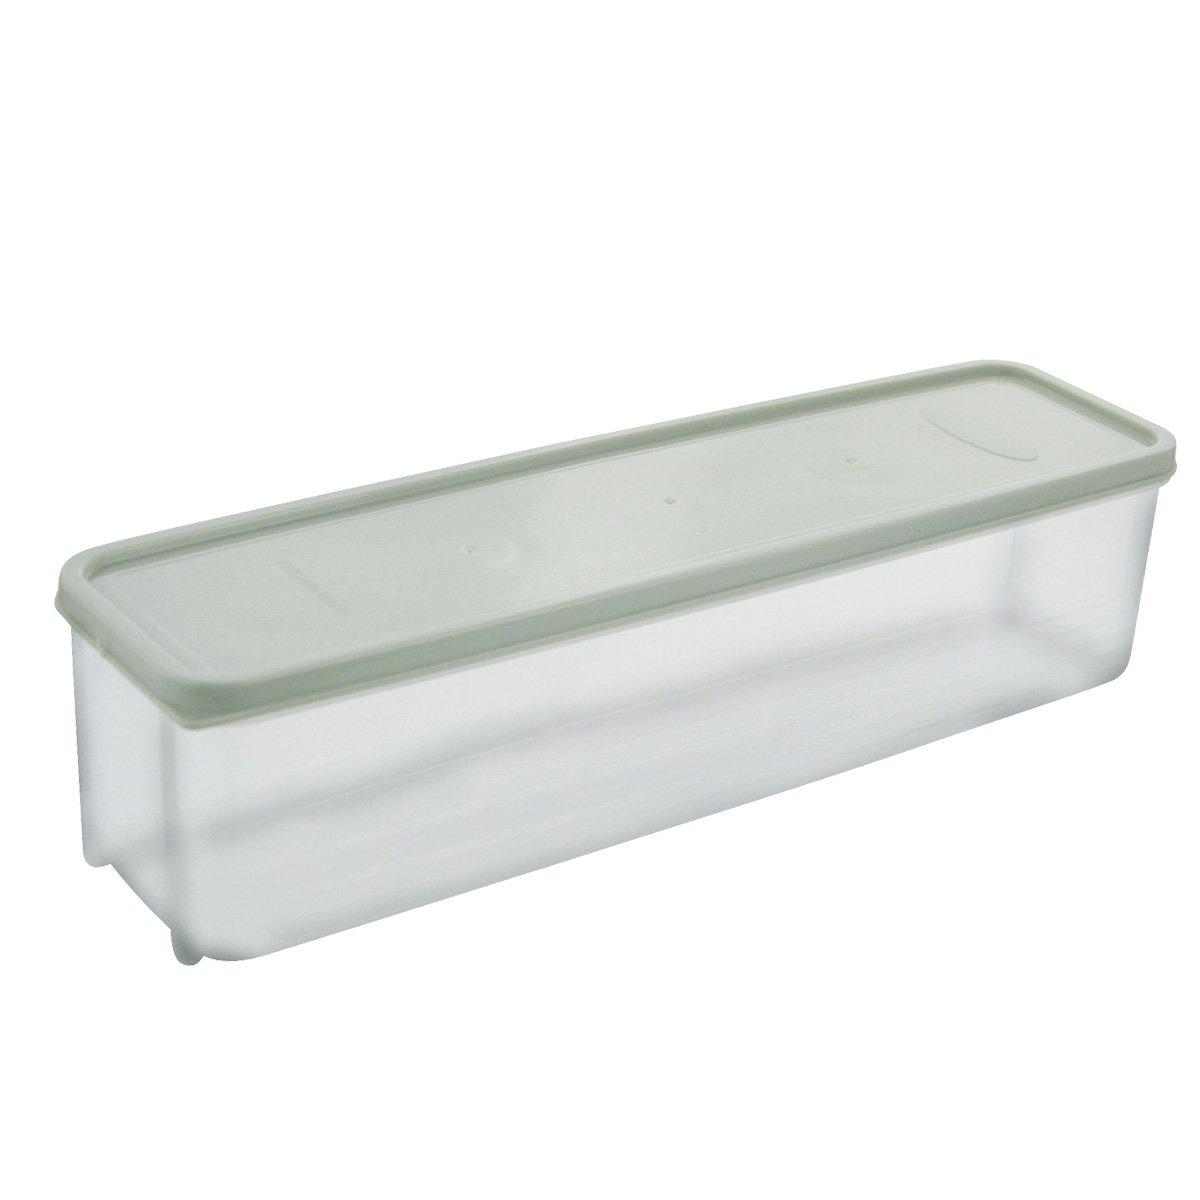 Guardians Pasta Box Kitchen Refrigerator Noodle Box Plastic Cover Food  Storage Container